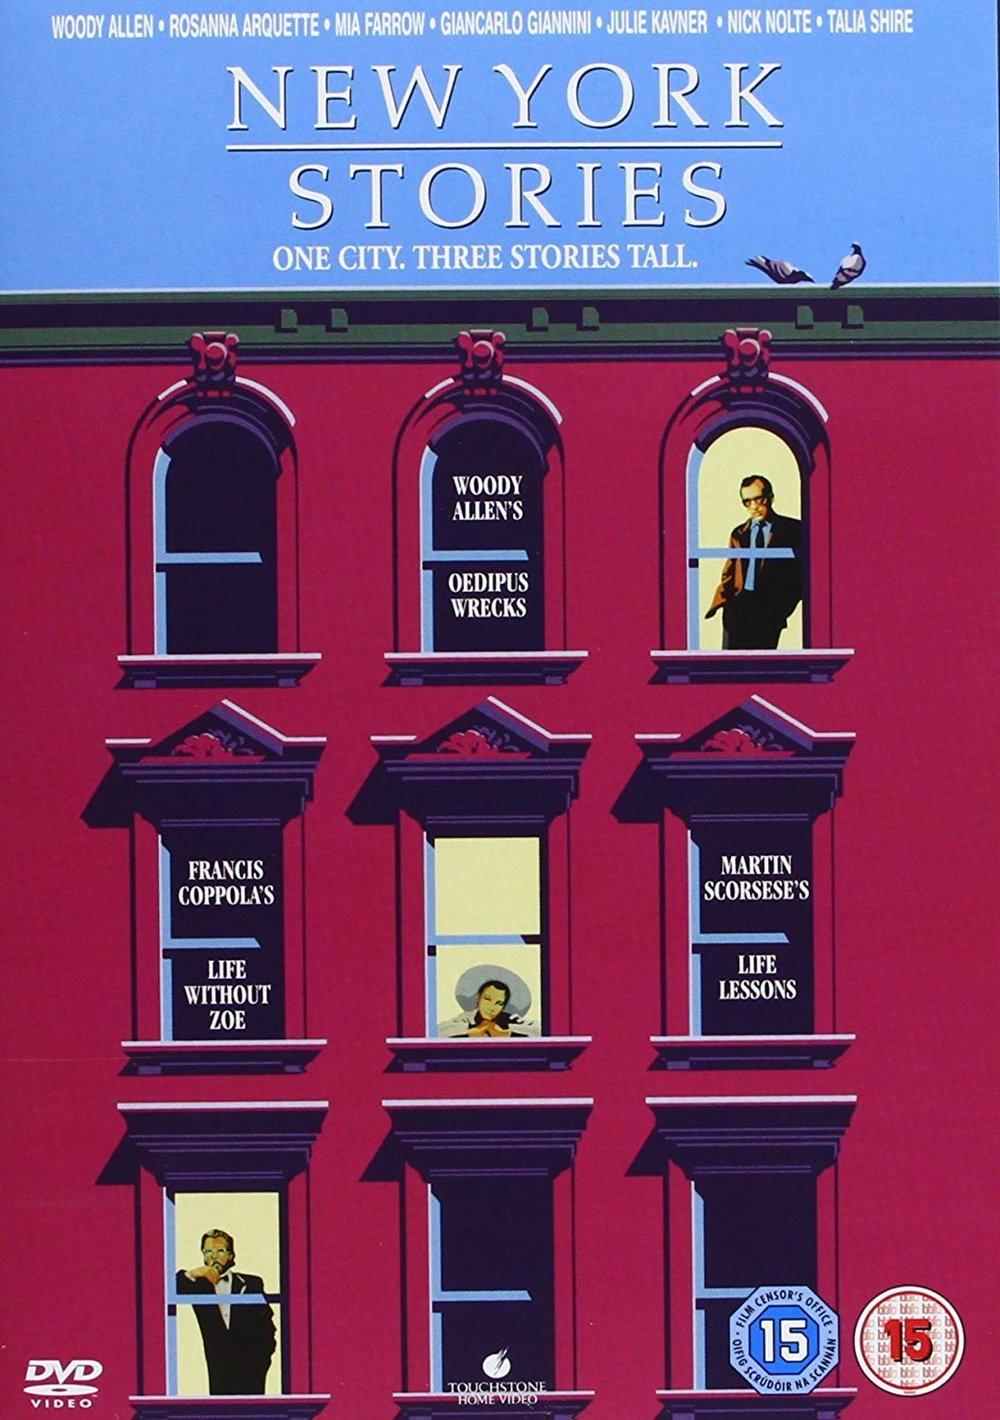 Martin Scorsese - New York Stories.jpg